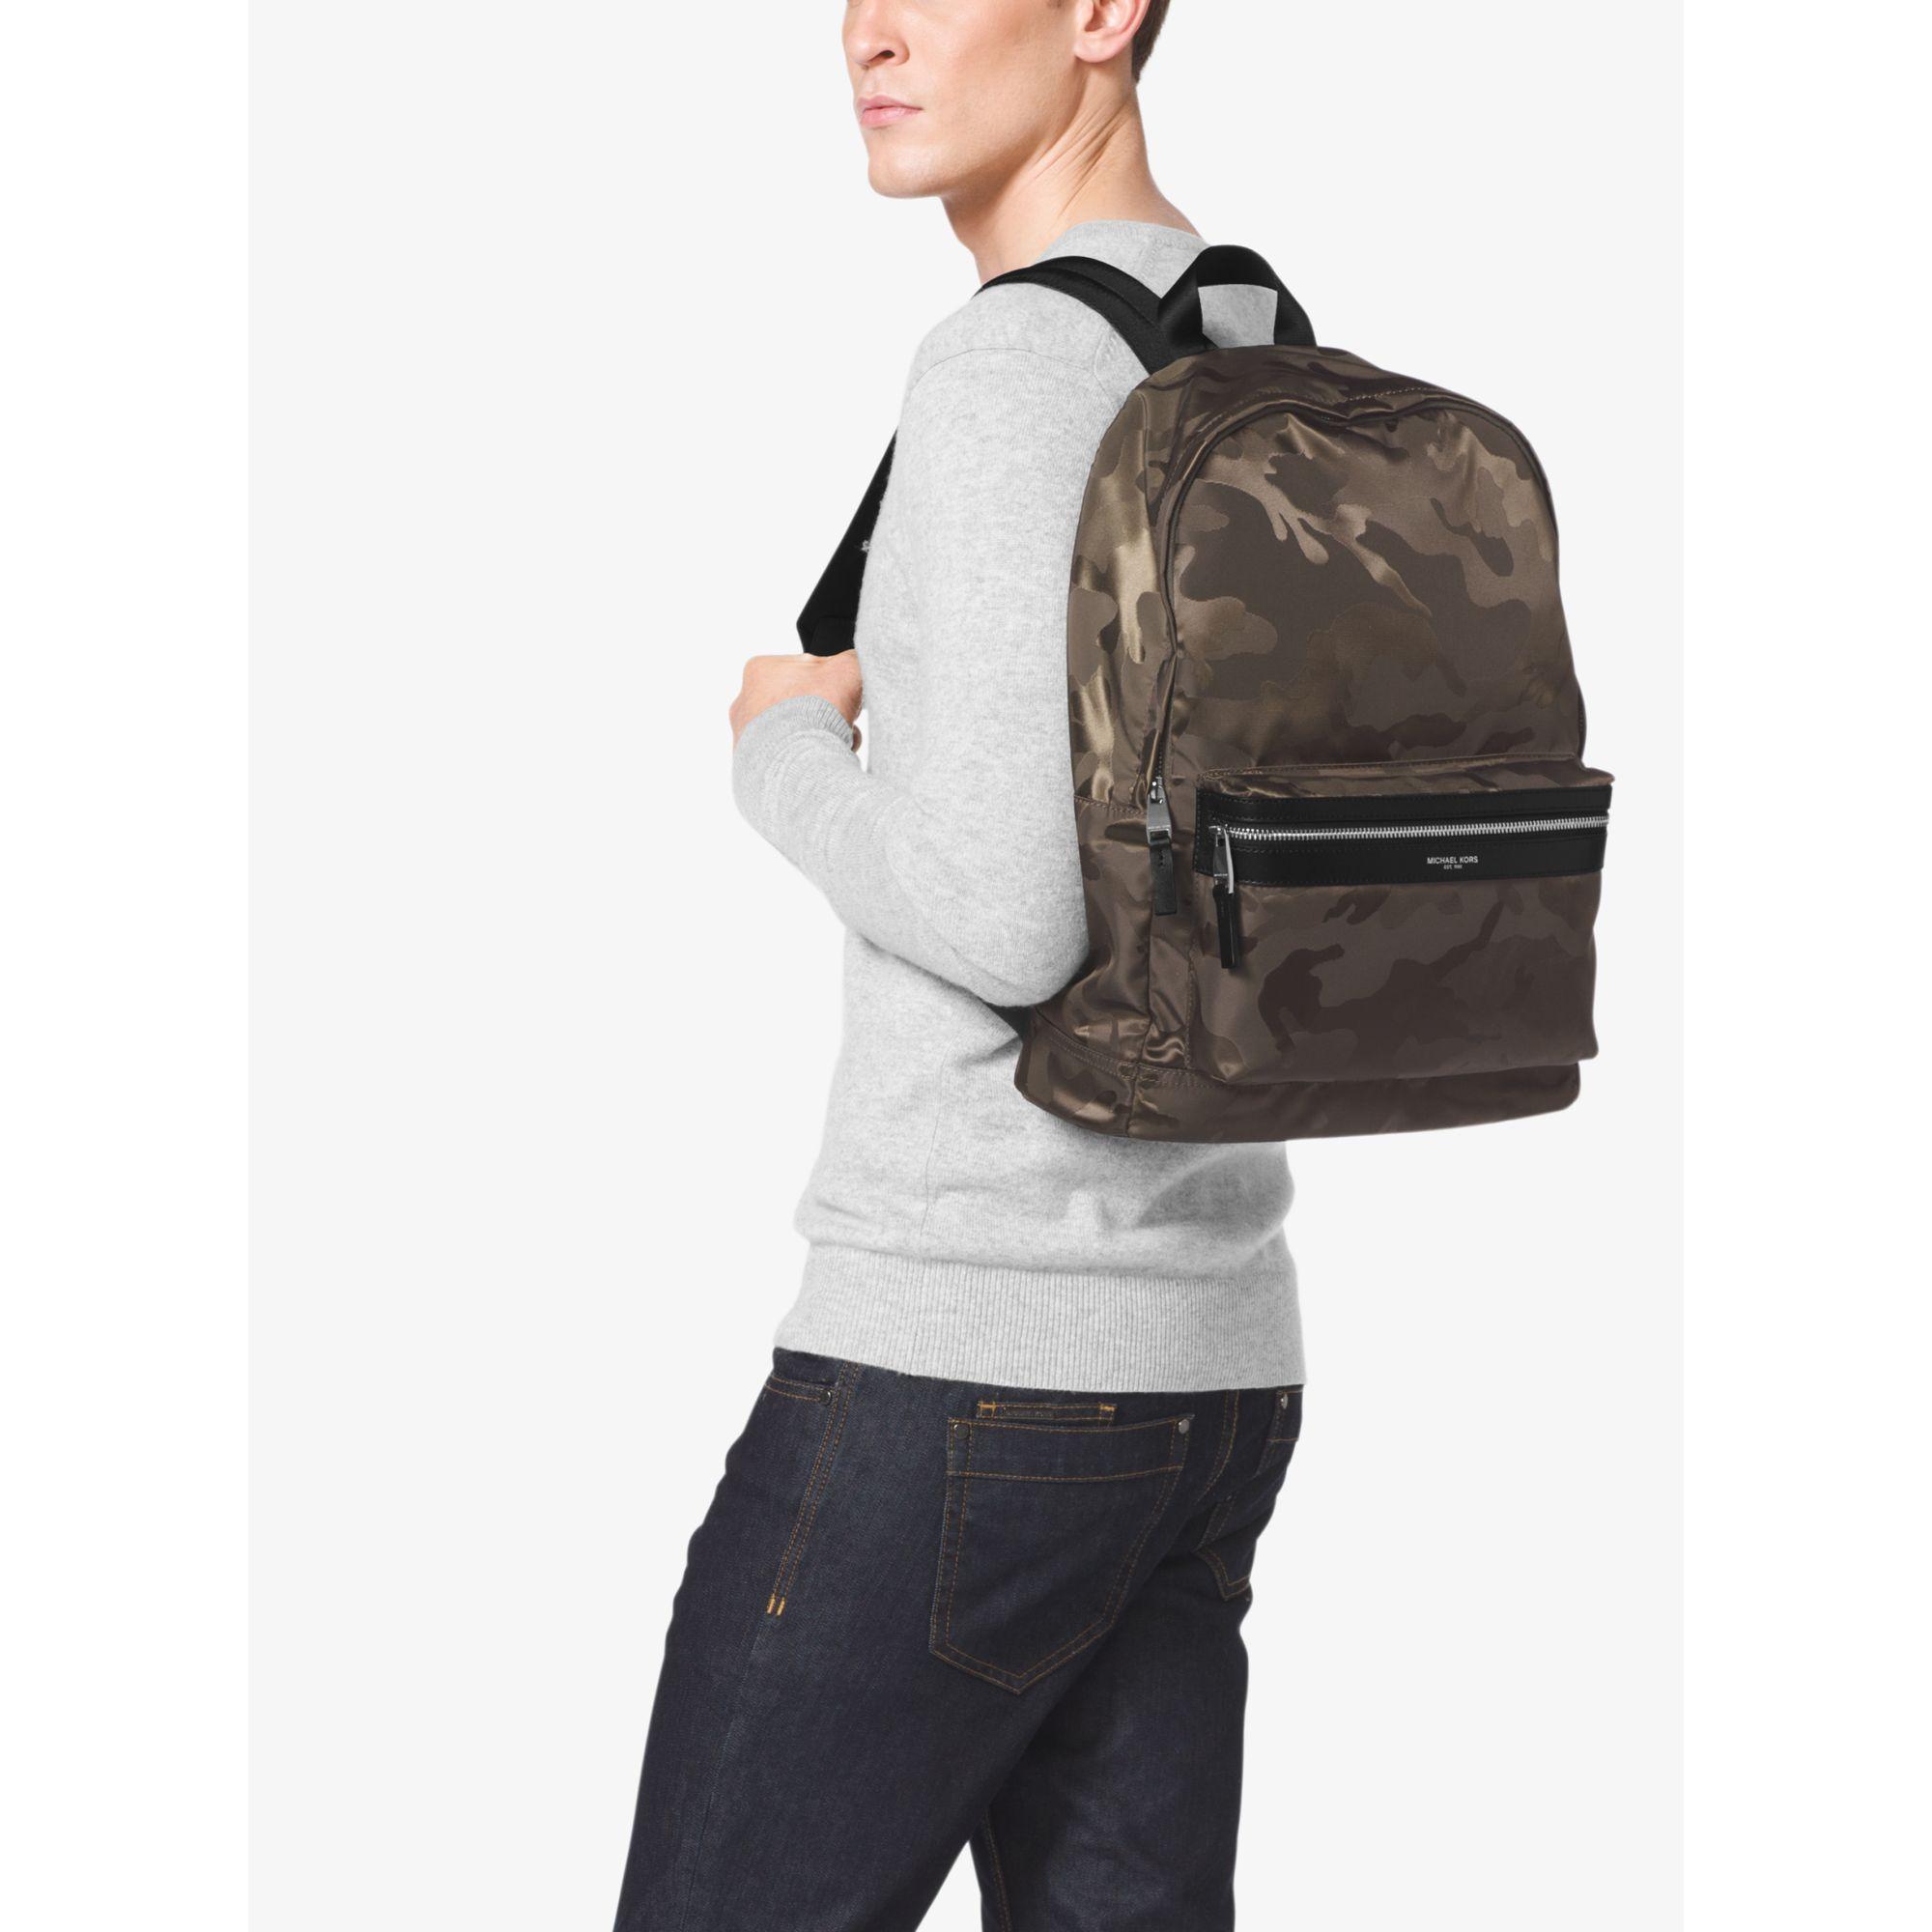 774677b7556c Michael Kors Kent Camouflage Nylon Jacquard Backpack in Green for ...